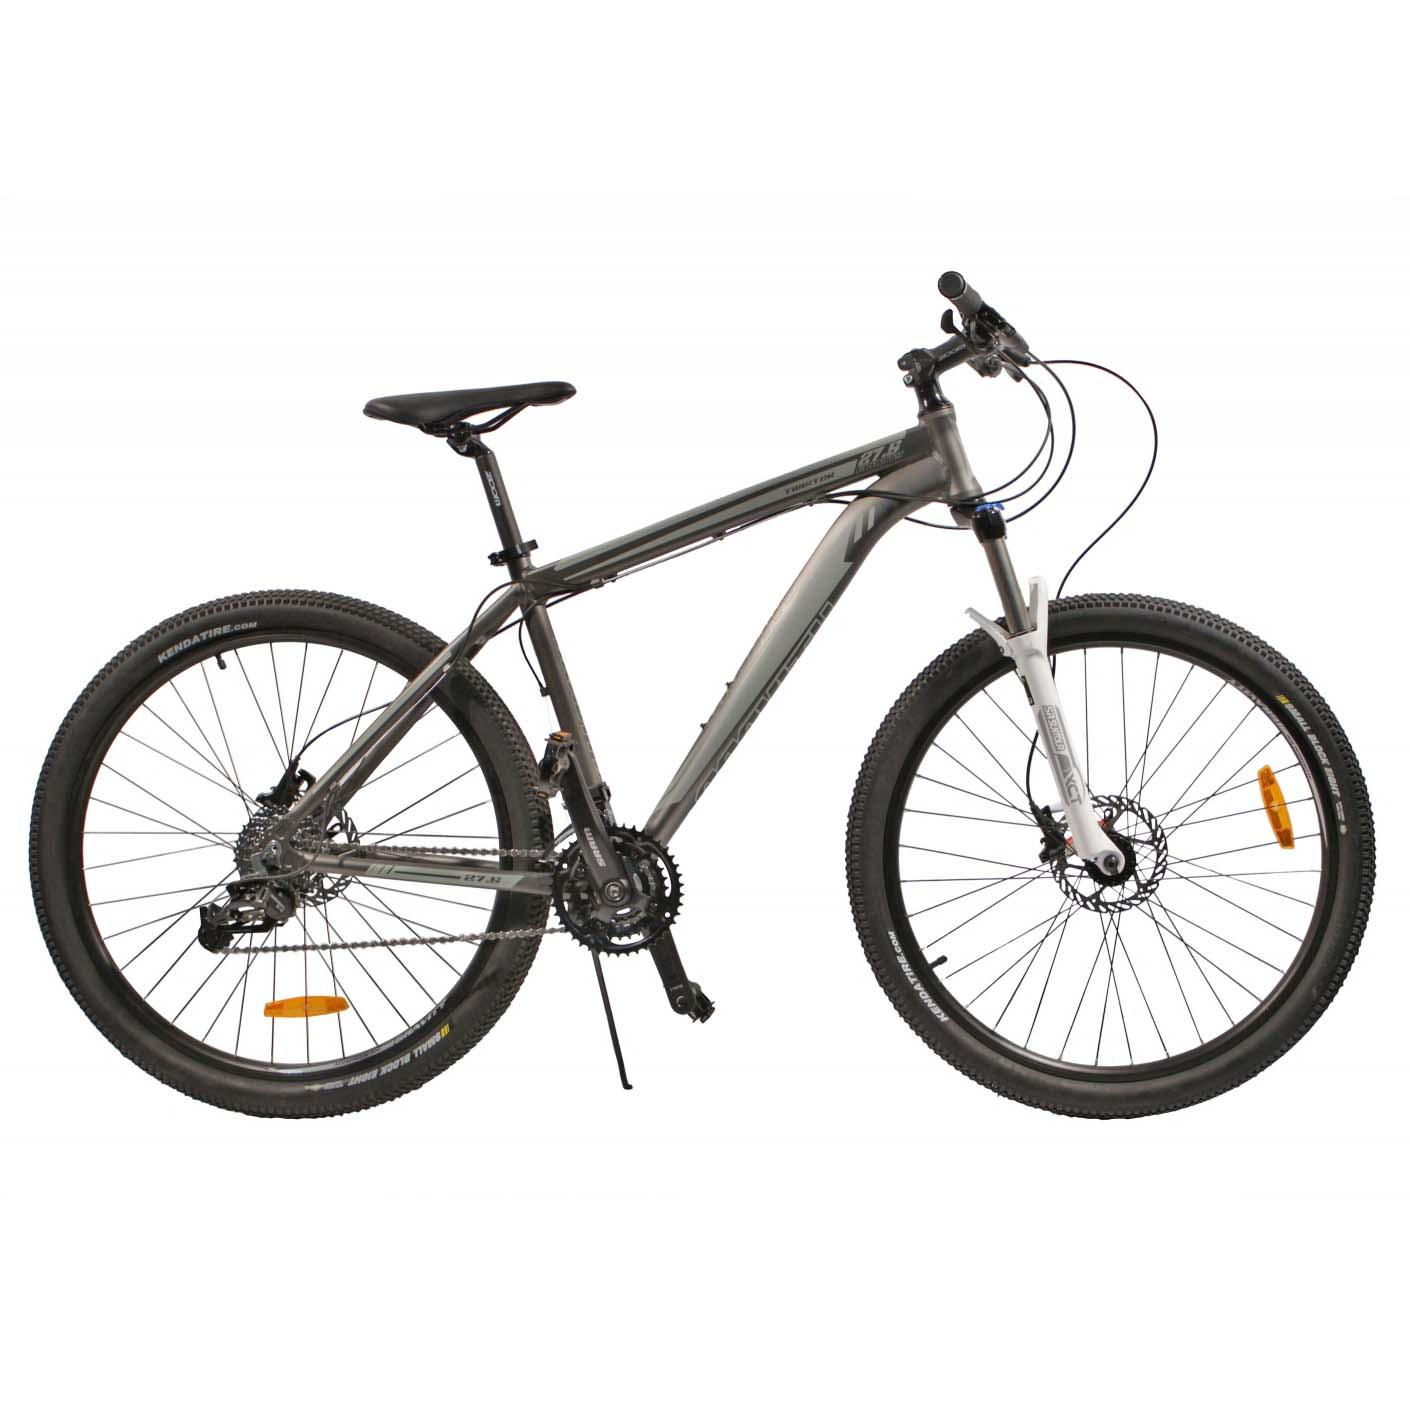 "Велосипед Gravity 27,5"" TWISTER 24 скор. алюм.рама 19"" гидравл.торм. серый (7401) УЦЕНКА!!! 270917"